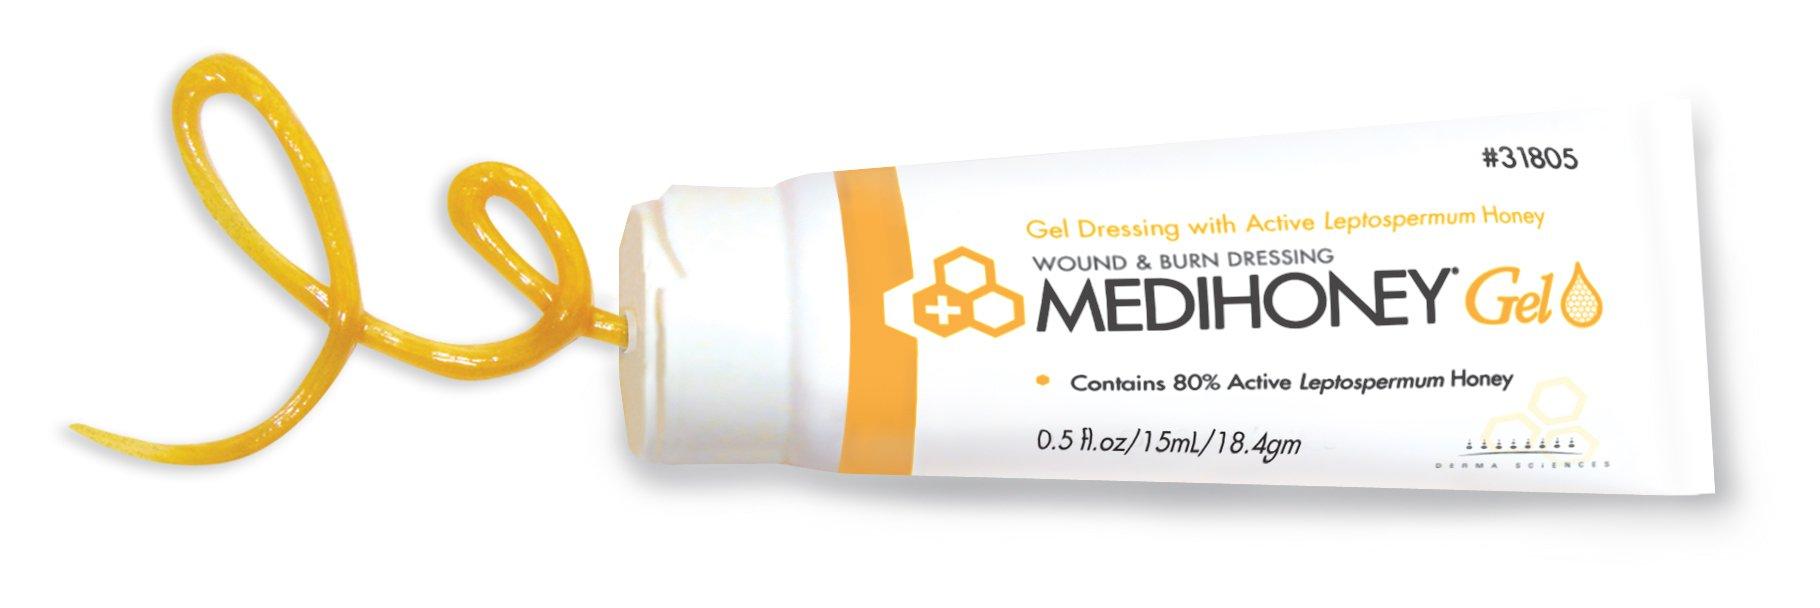 MEDIHONEY Wound and Burn Dressing Gel 1.5 oz. Tube Sterile, 31815 - EACH